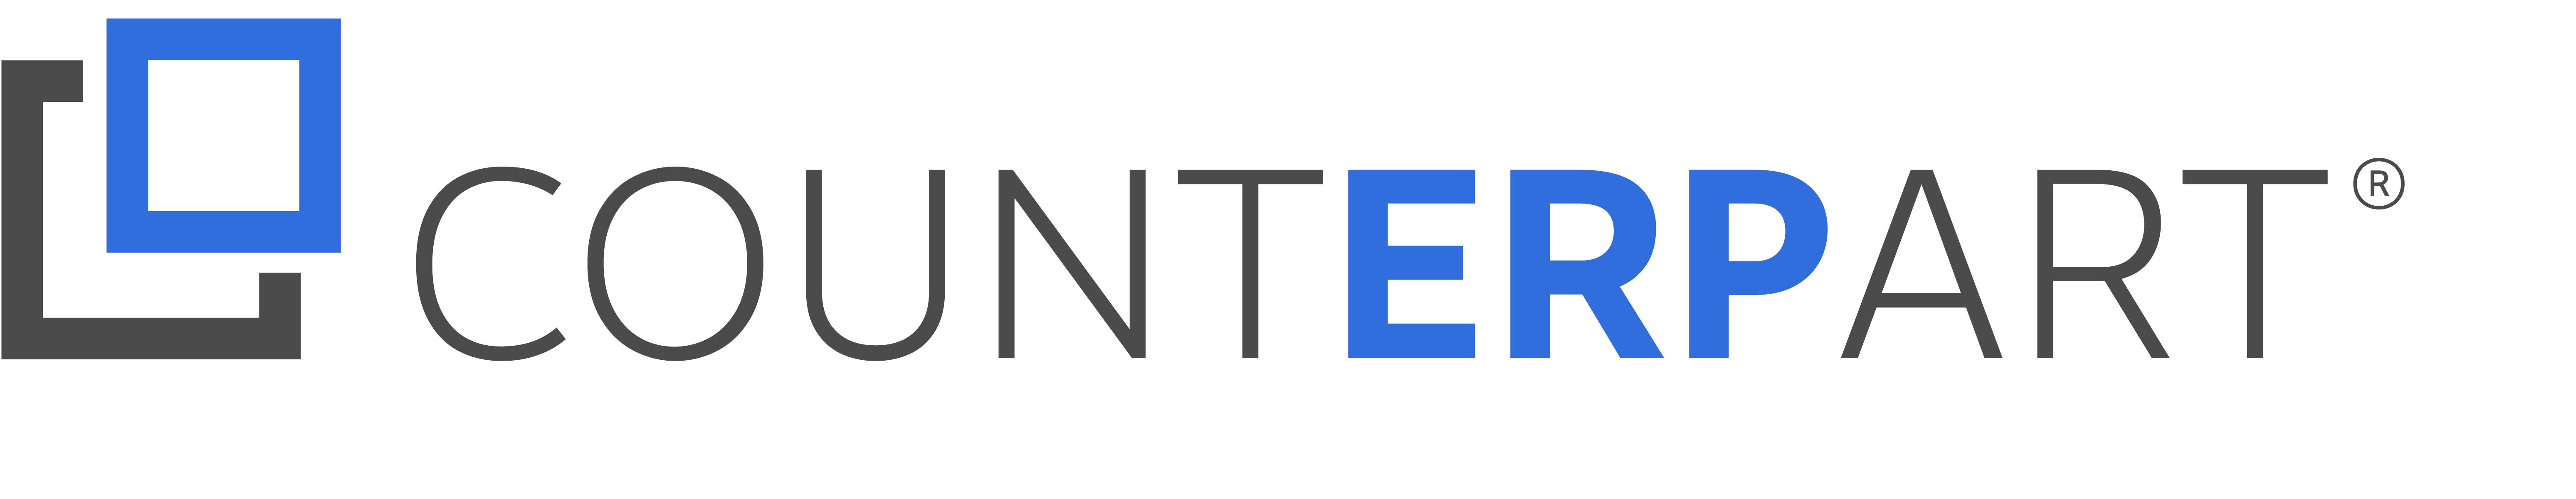 COUNTERPART ETO ERP Provides SOLIDWORKS Integration